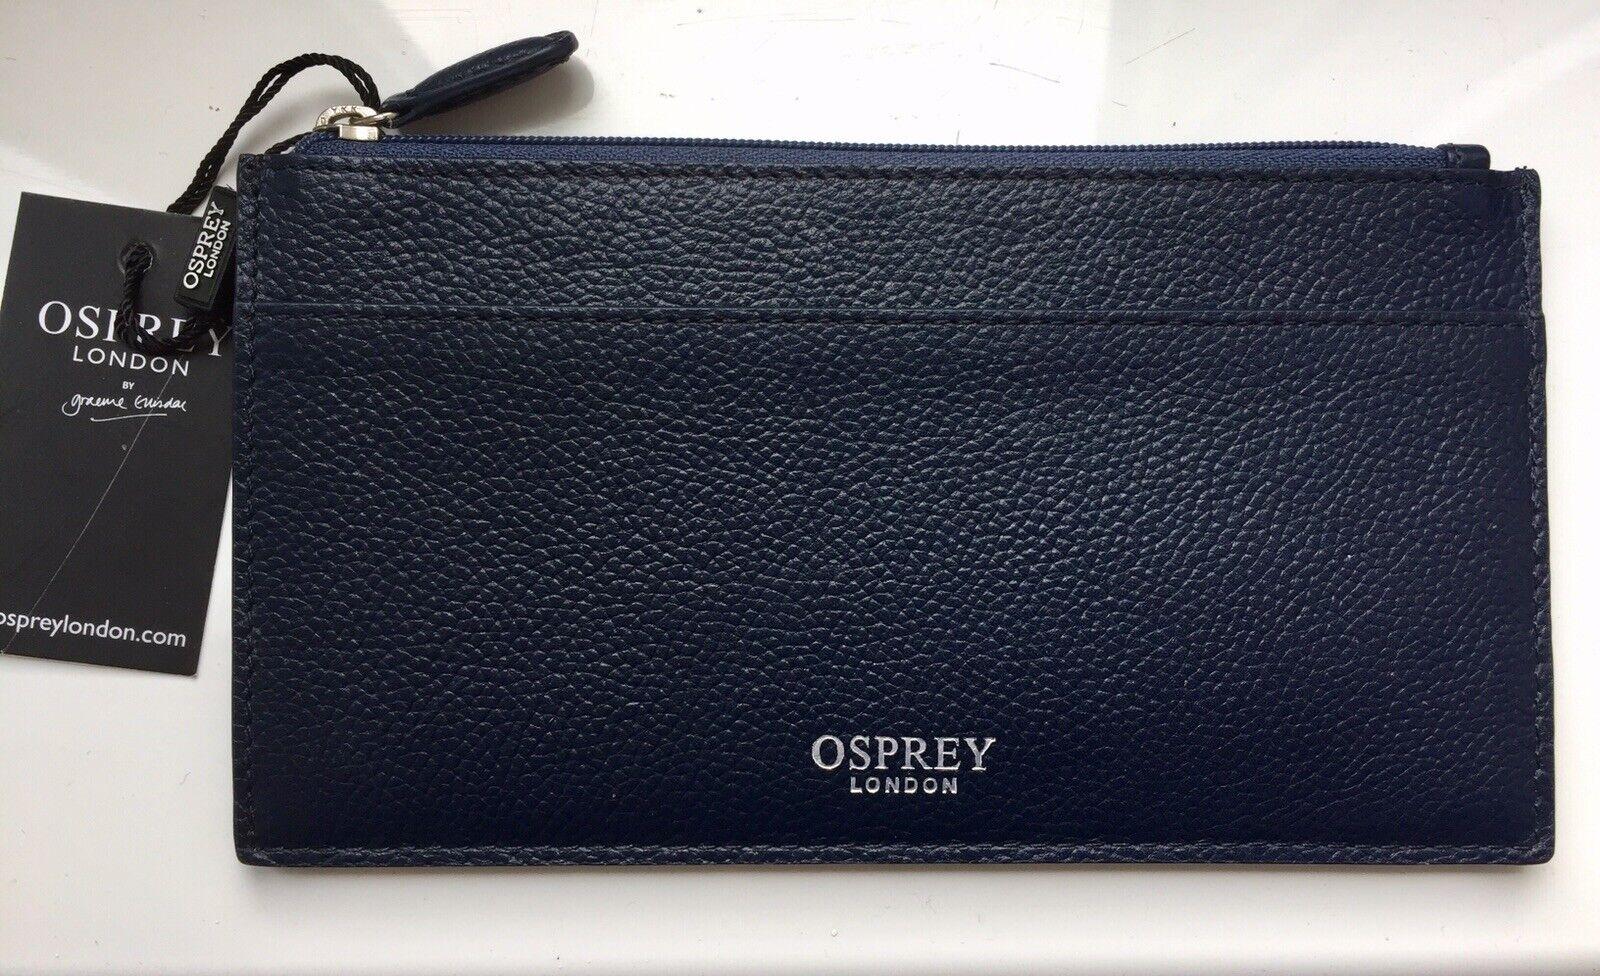 Osprey London - Navy Blue Leather 'Kellie' Card Holder Purse/Pouch, BNWT RRP